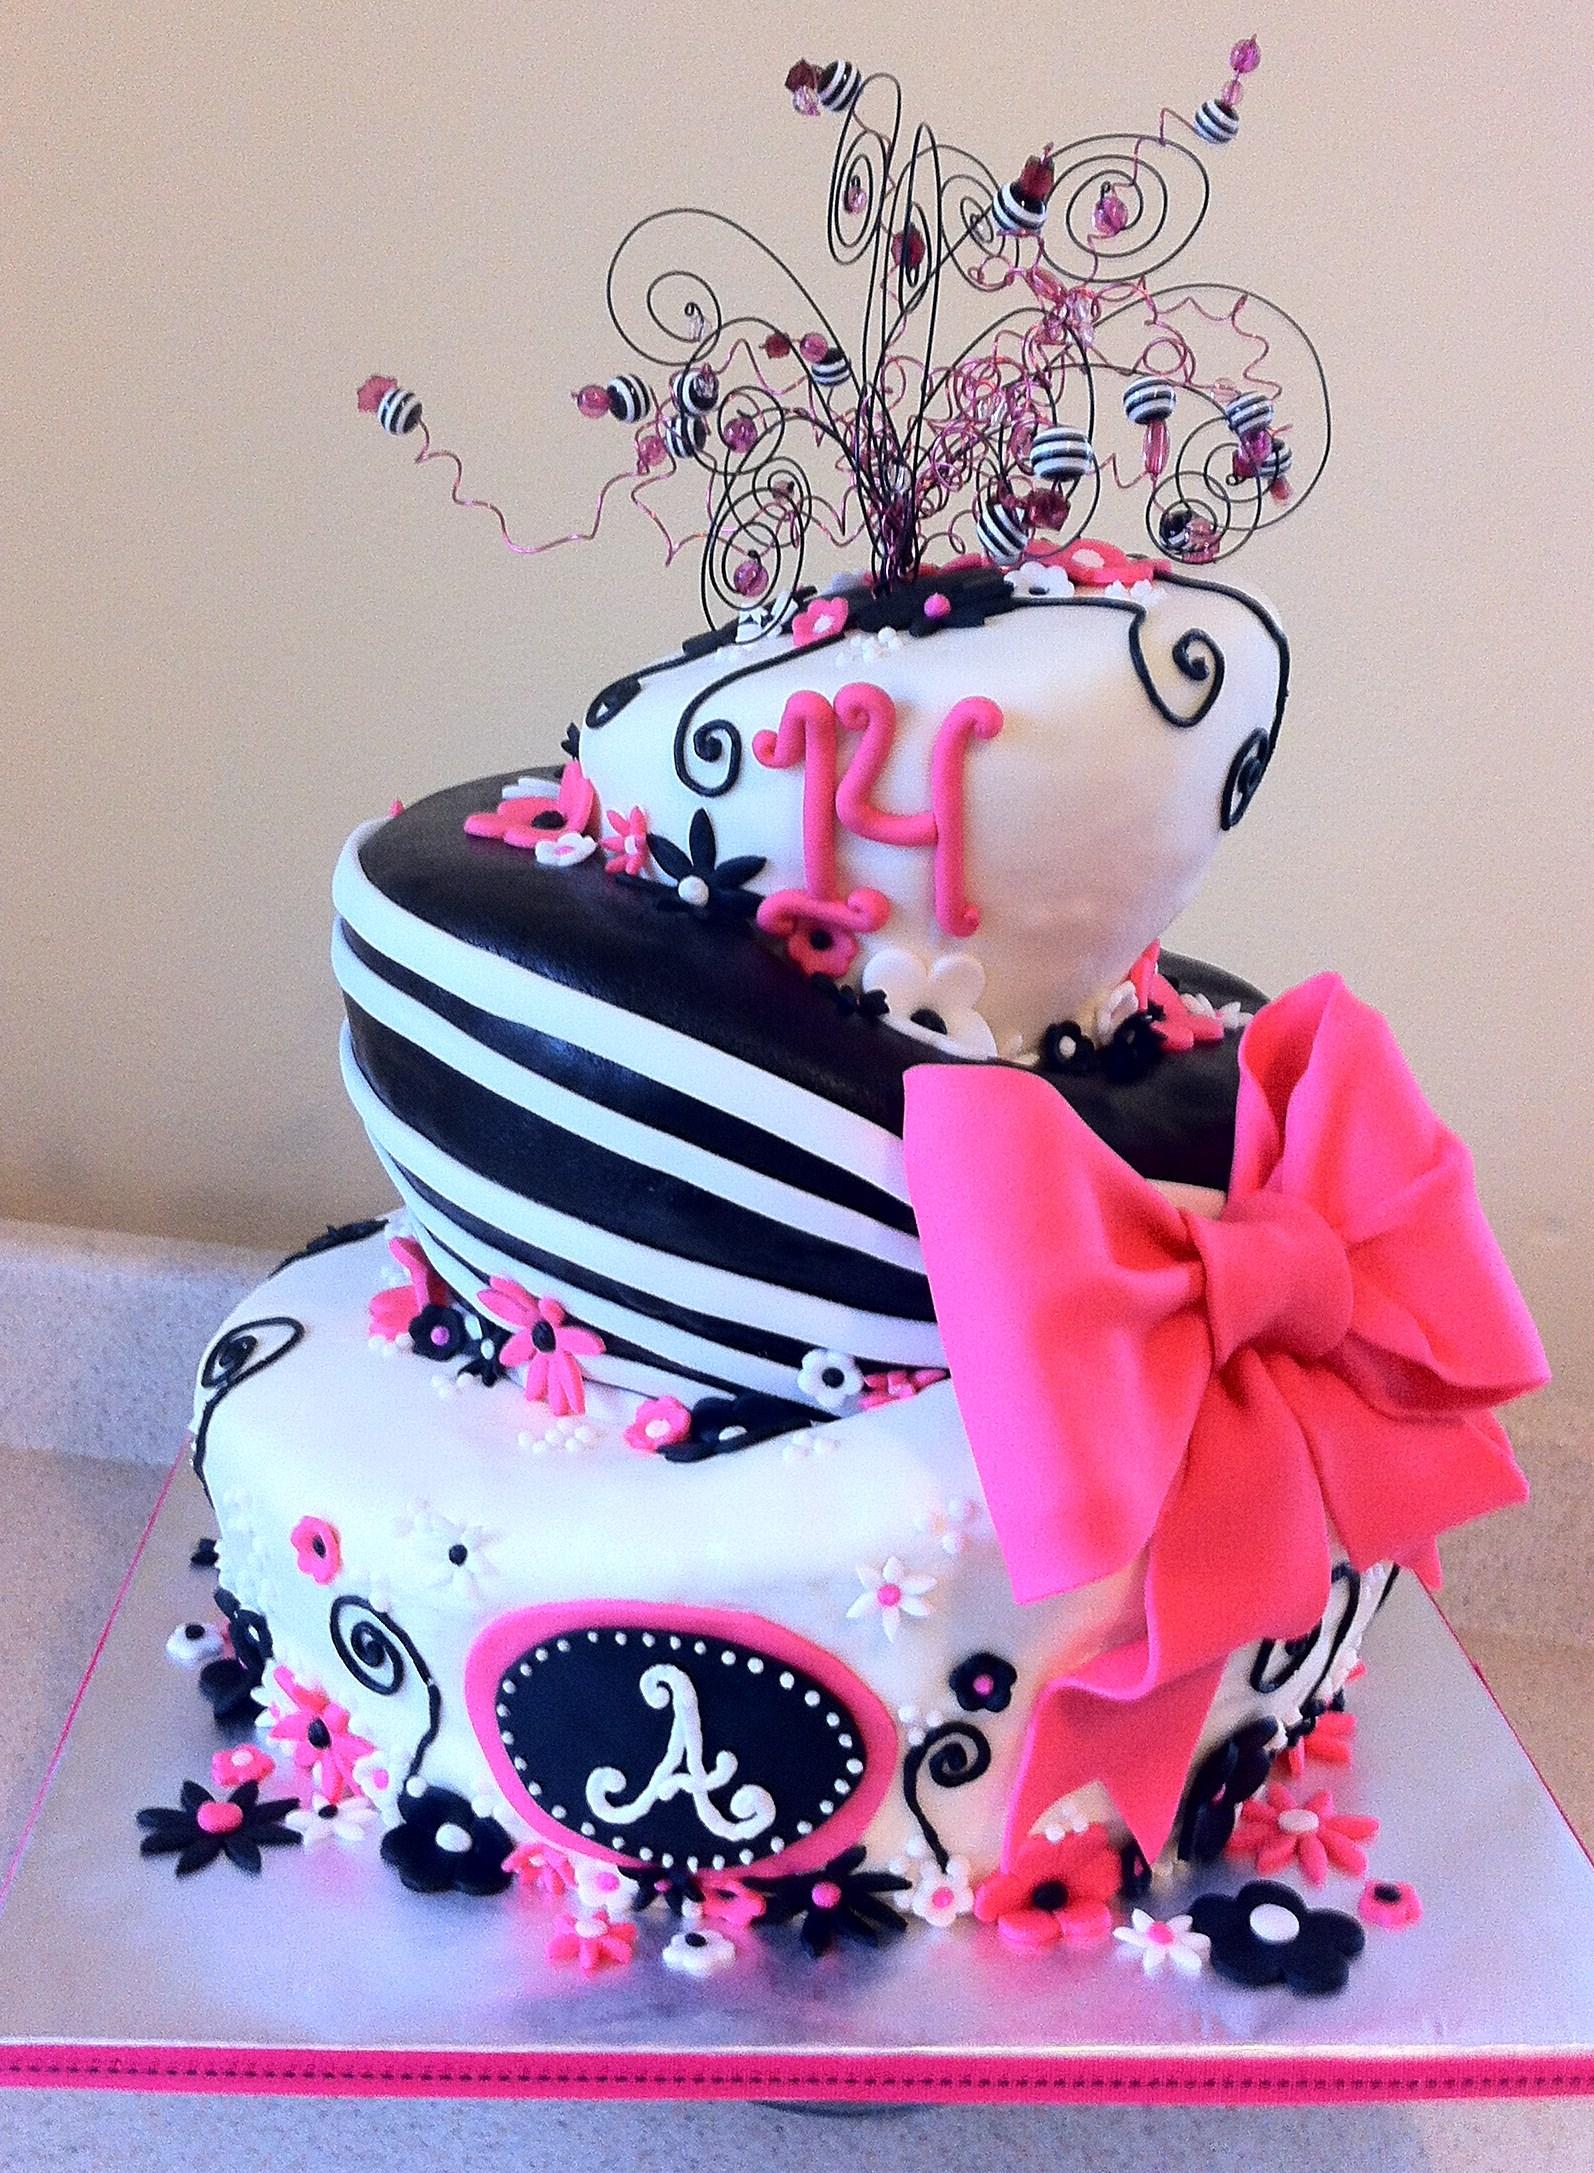 14th Birthday Cake Ideas images